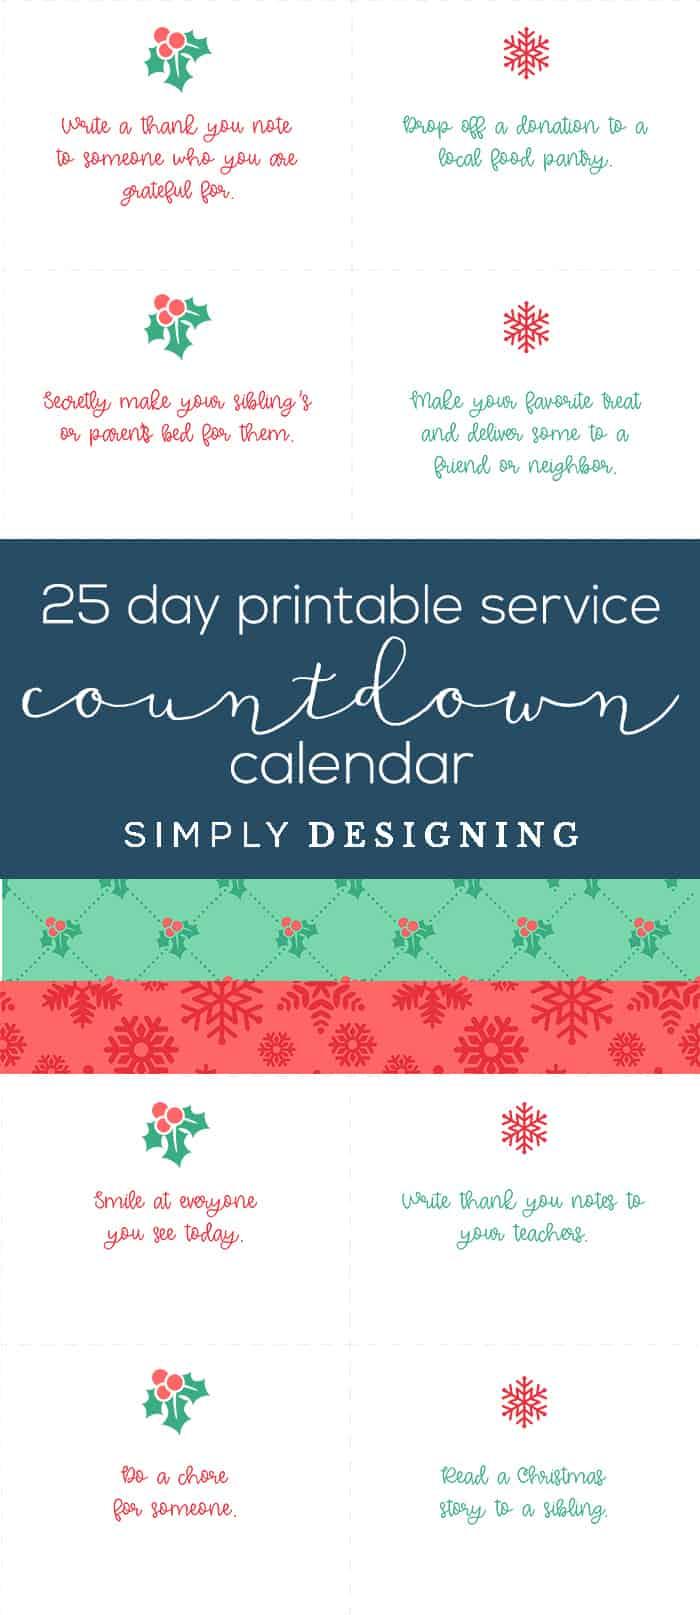 25 Day Free Printable Christmas Countdown Calendar - service countdown calendar - #ad #bhghowiholiday #bhglivebetter #bhgatwalmart @BHGLiveBetter